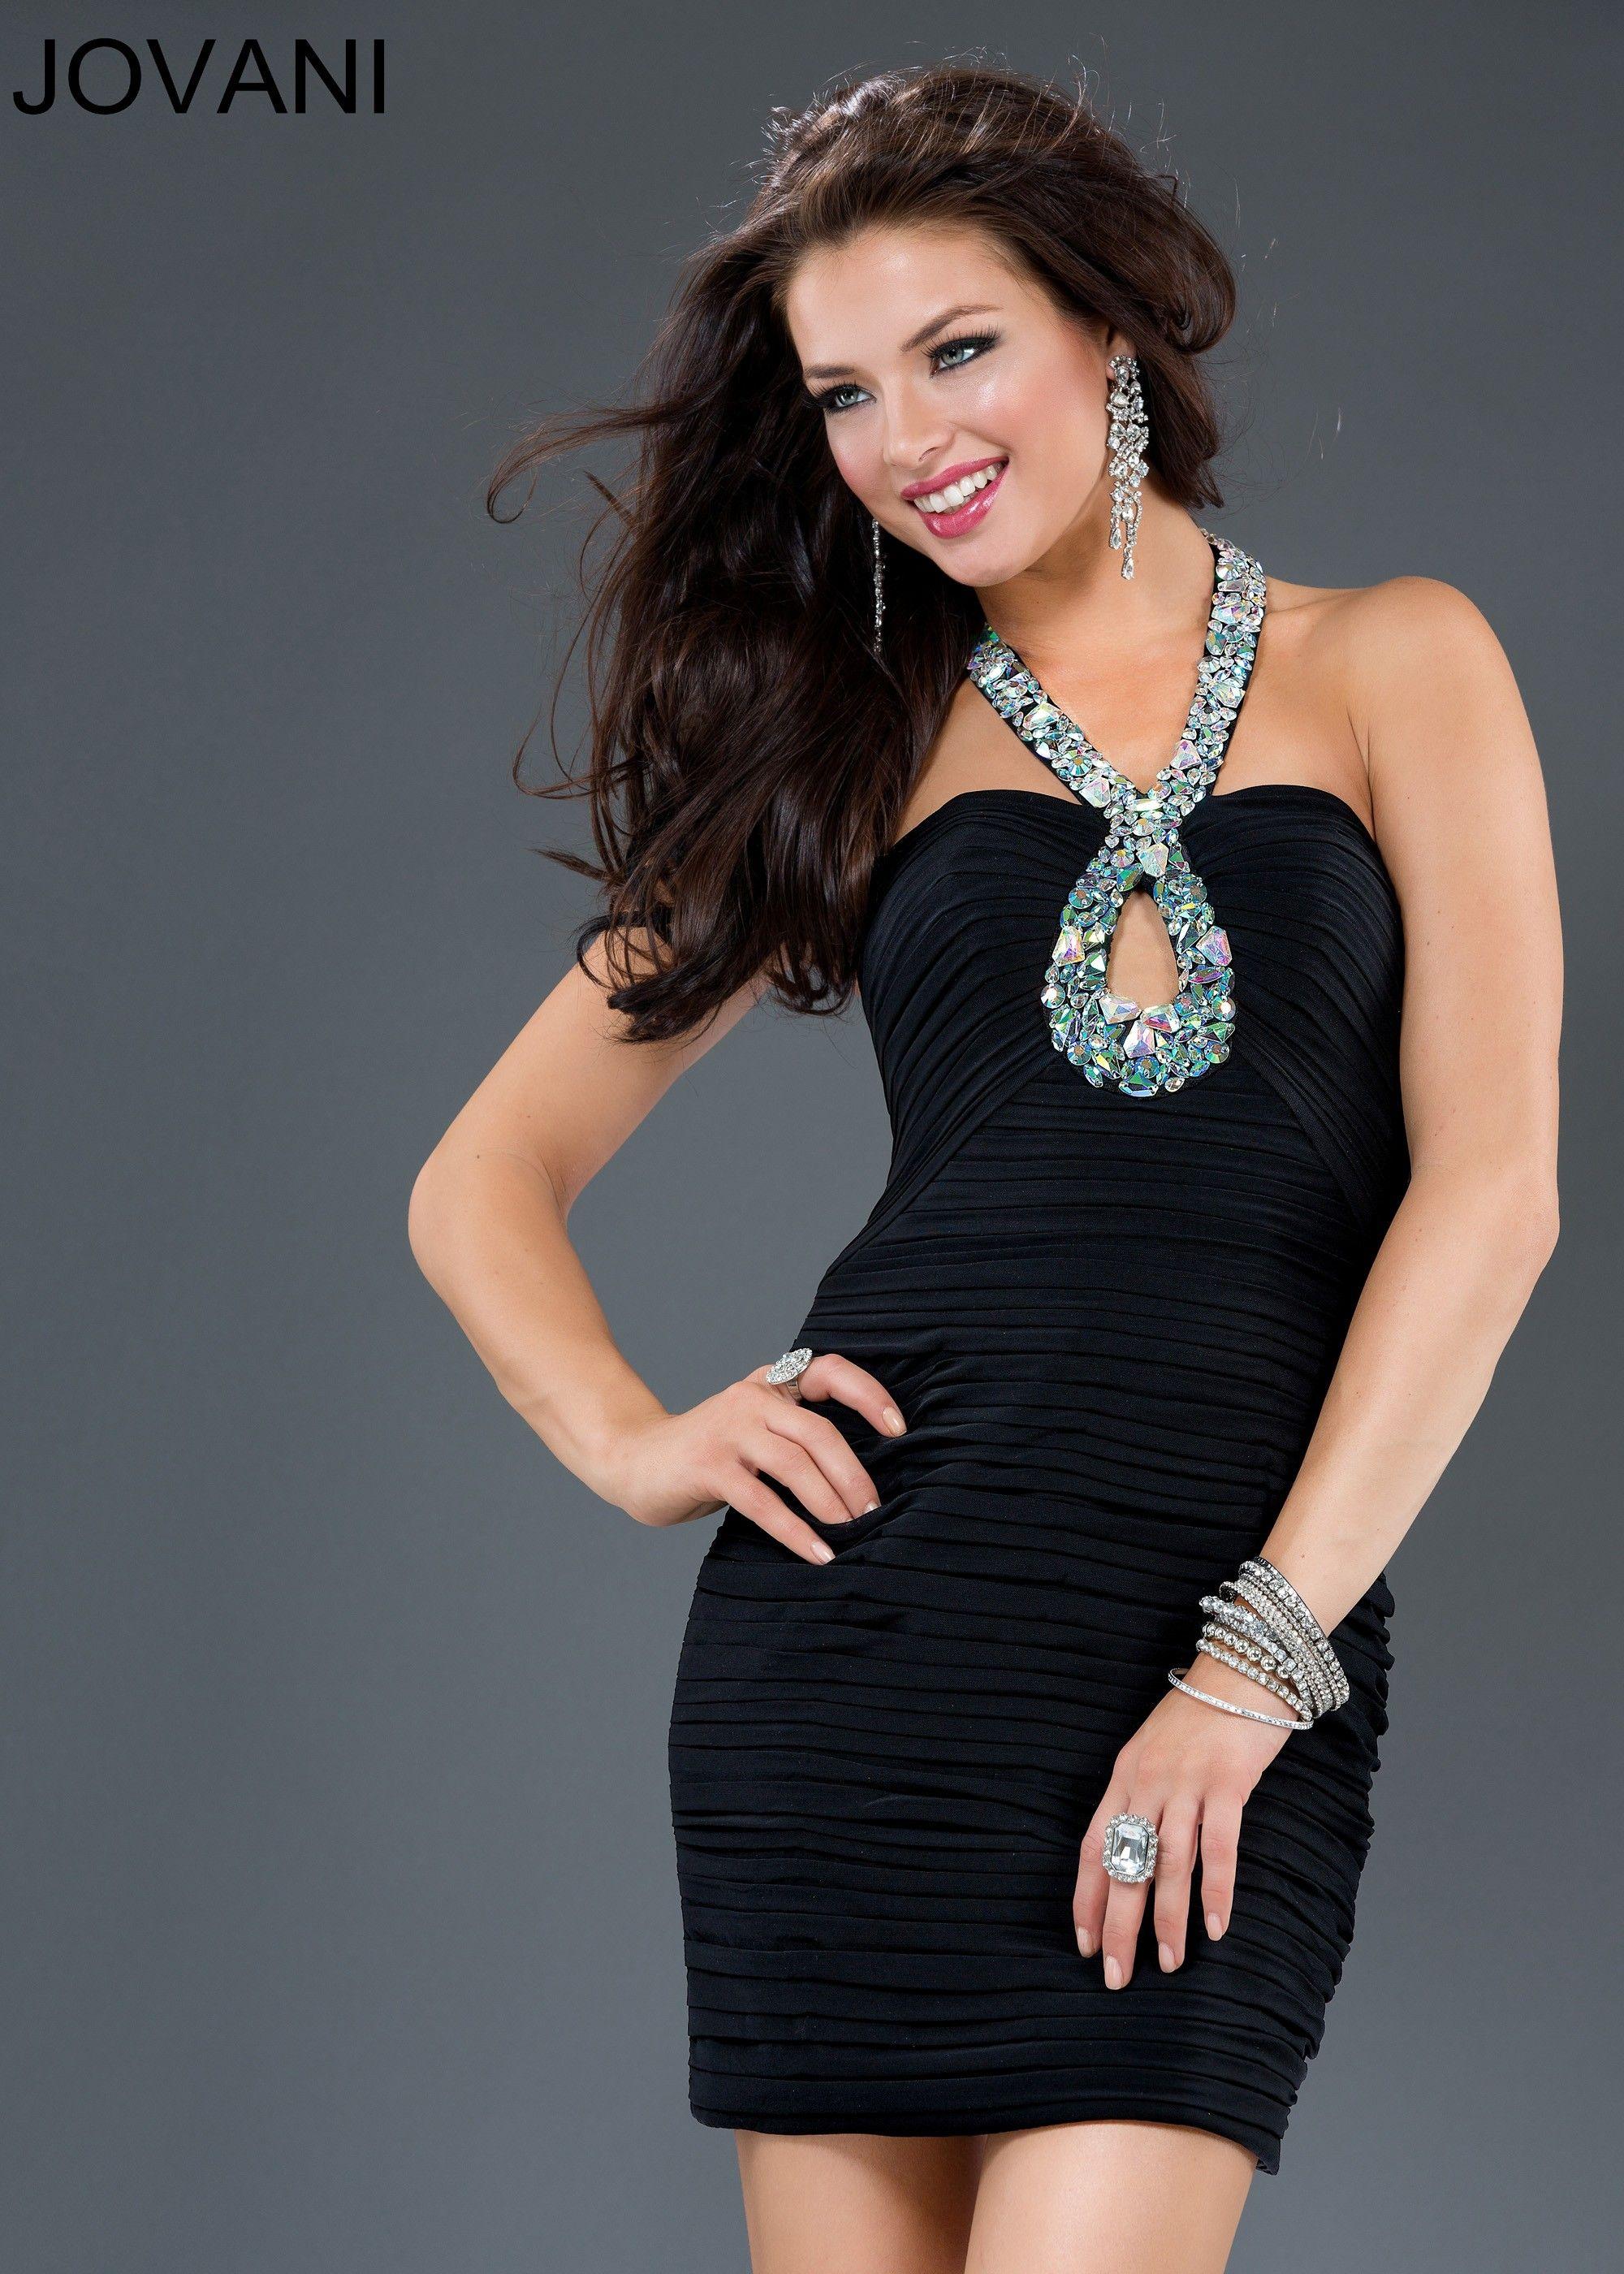 Jovani 90358 Jeweled Halter Dress | Little Black Dresses | Pinterest